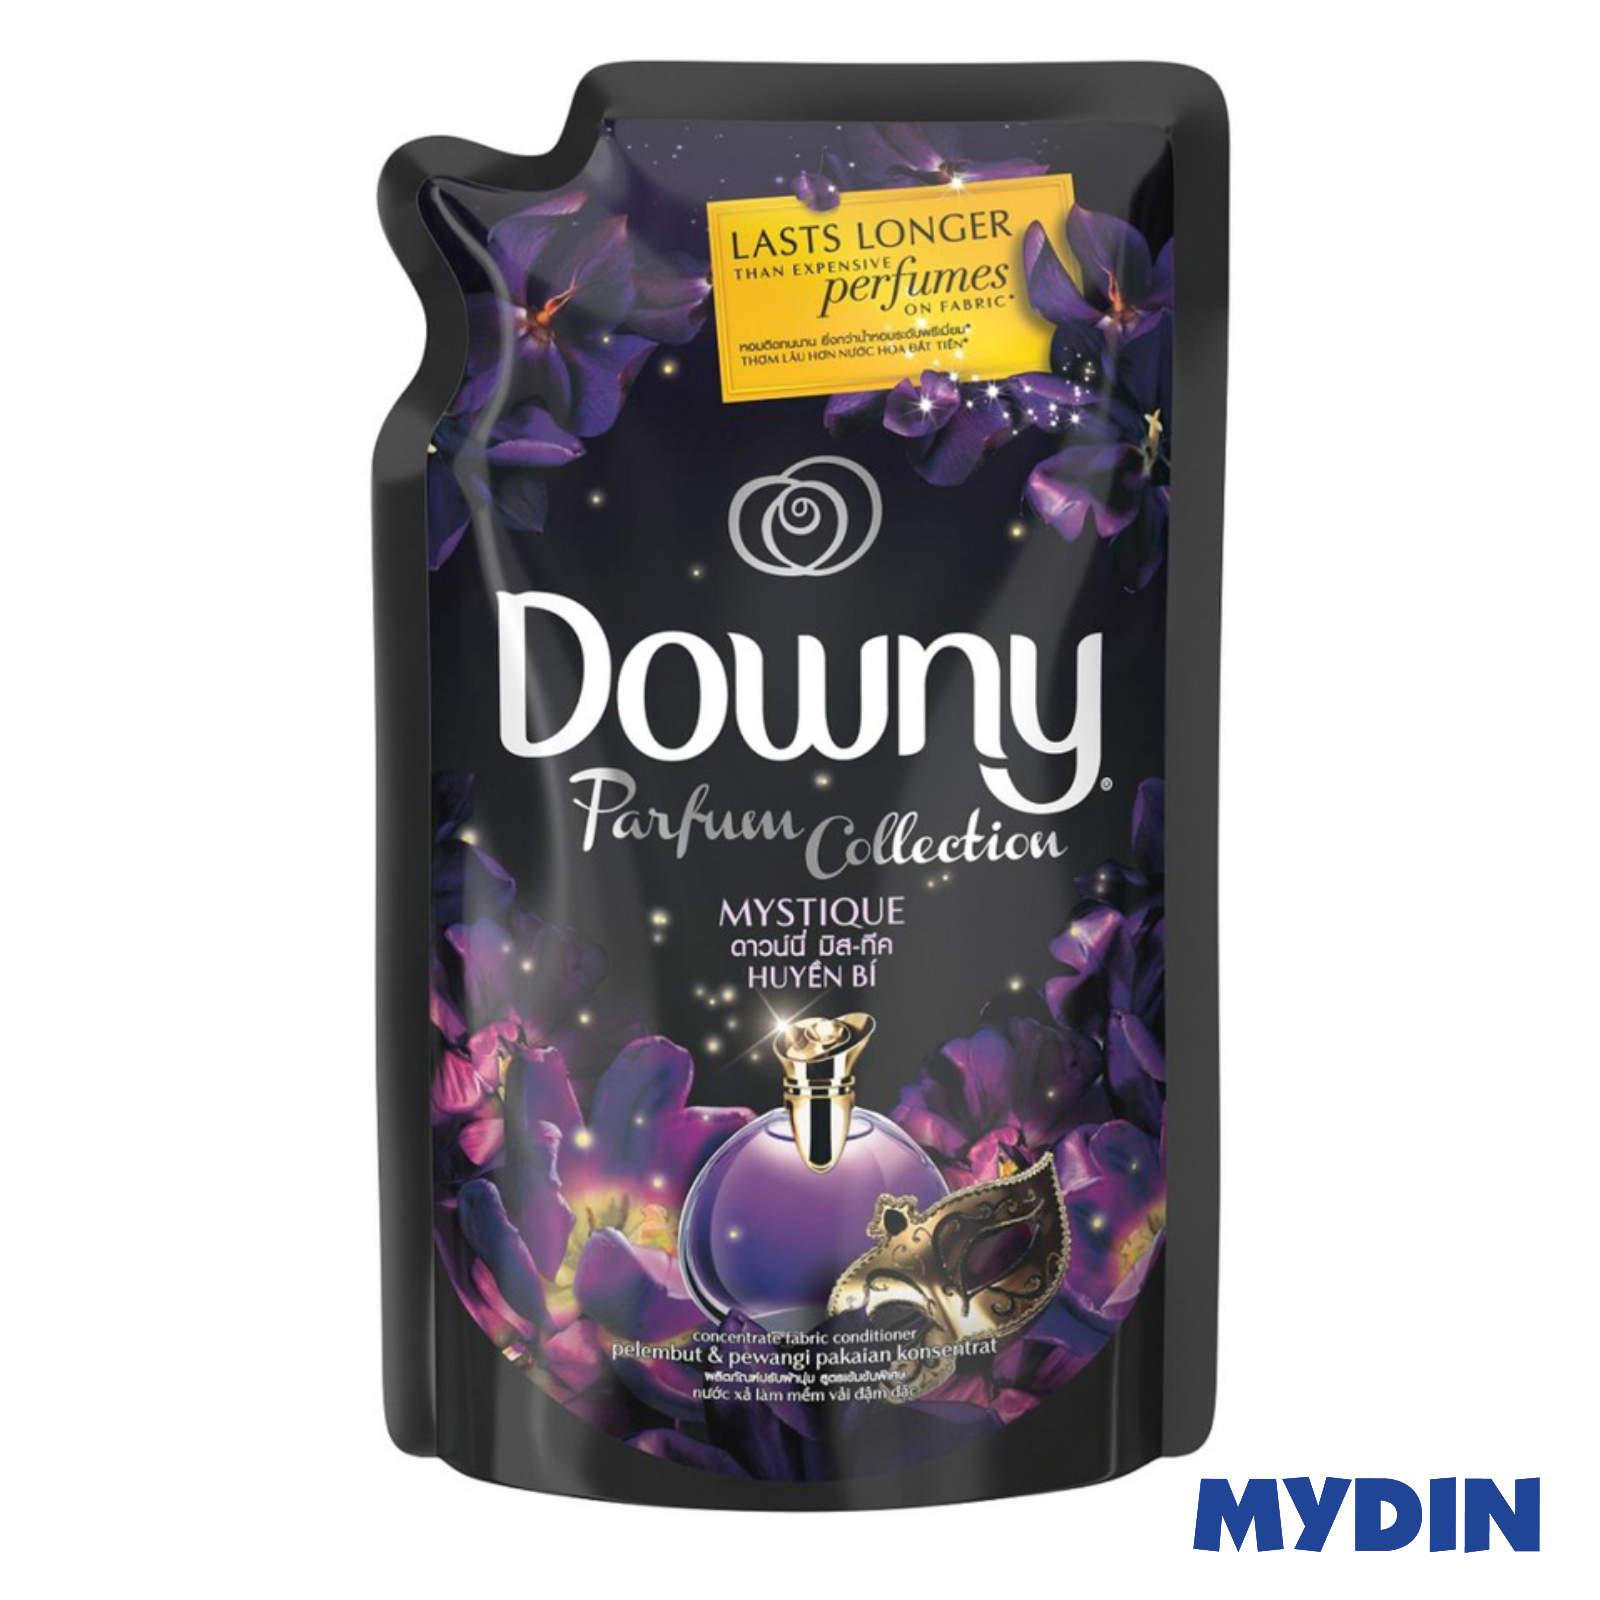 Downy Parfum Fabric Conditioner Refill - 4 Variants (530ml)